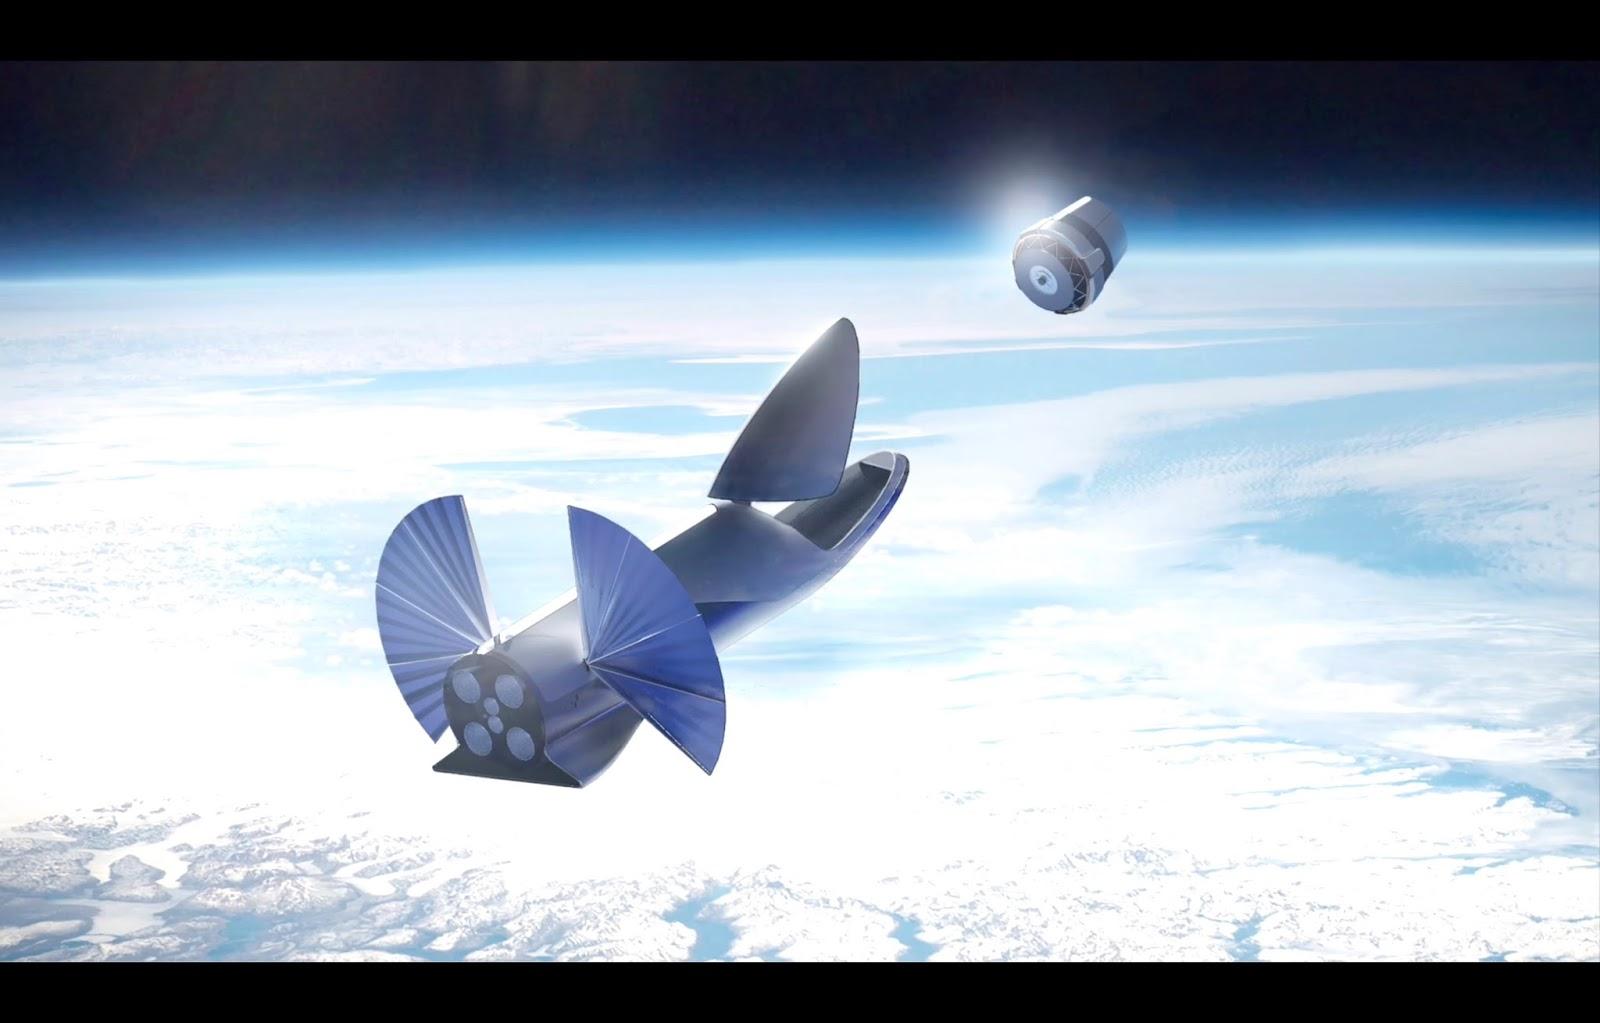 Tough SF: SpaceX SFR: Small Falcon Rocket